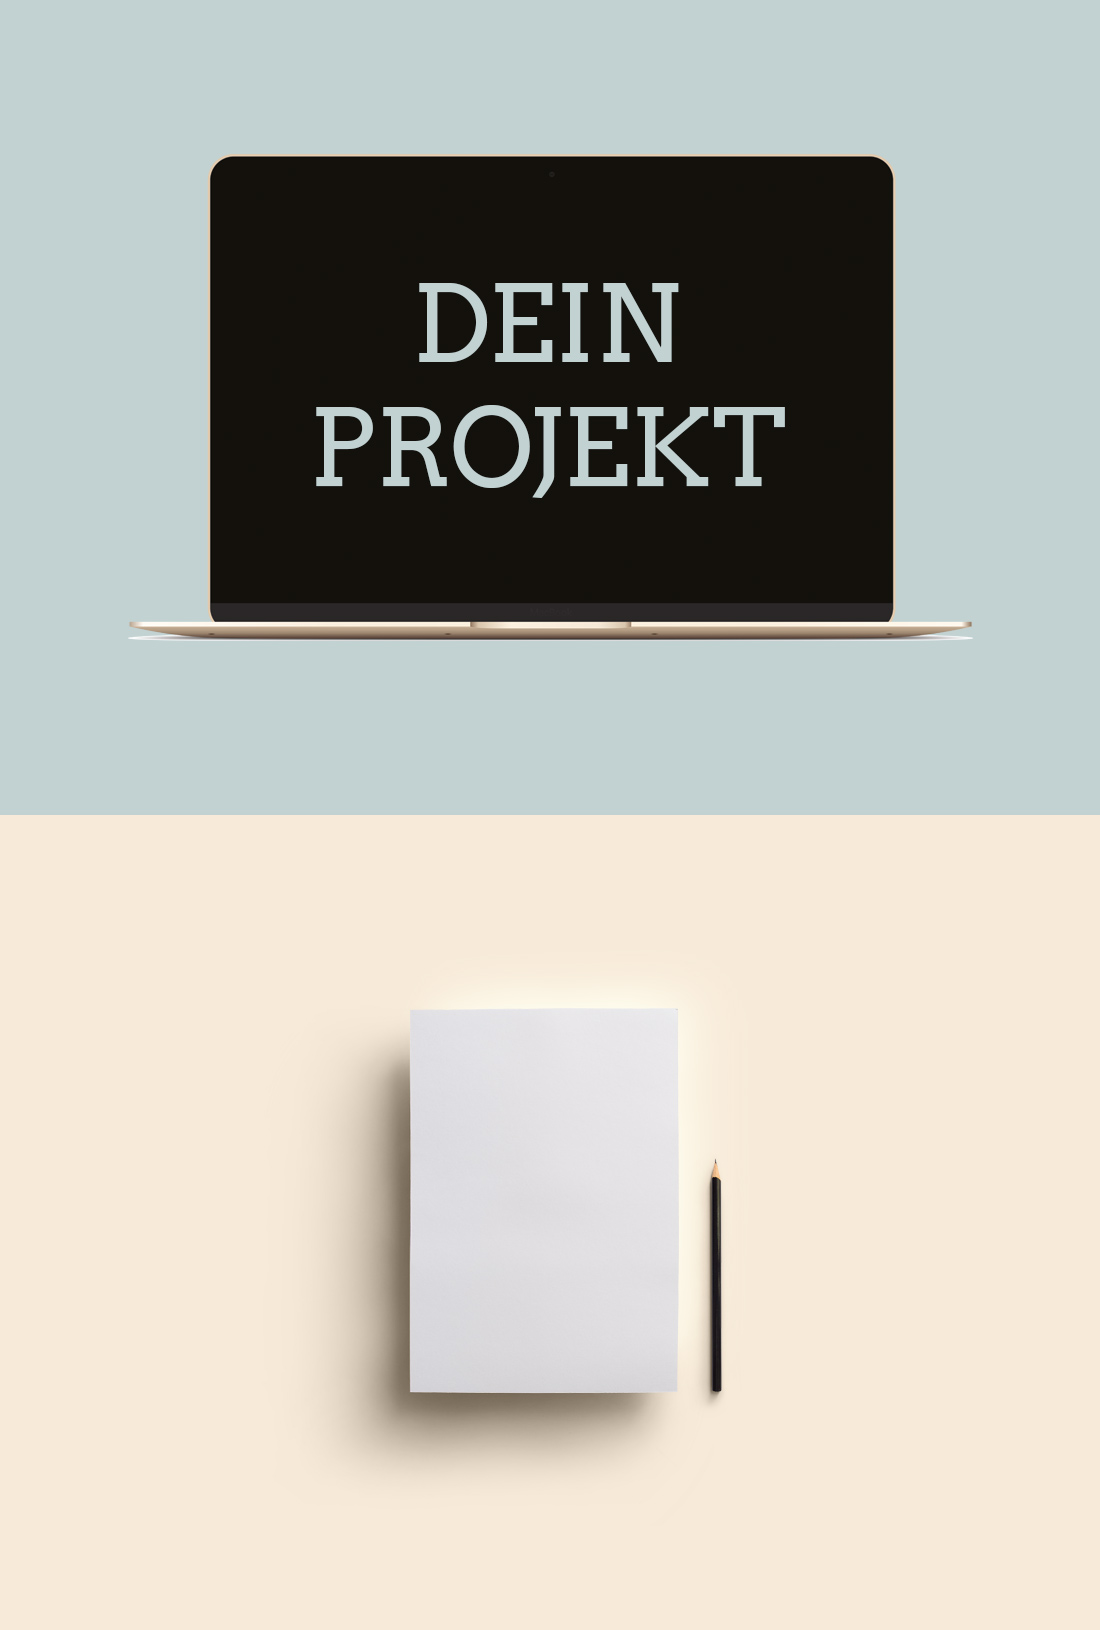 dein_projekt